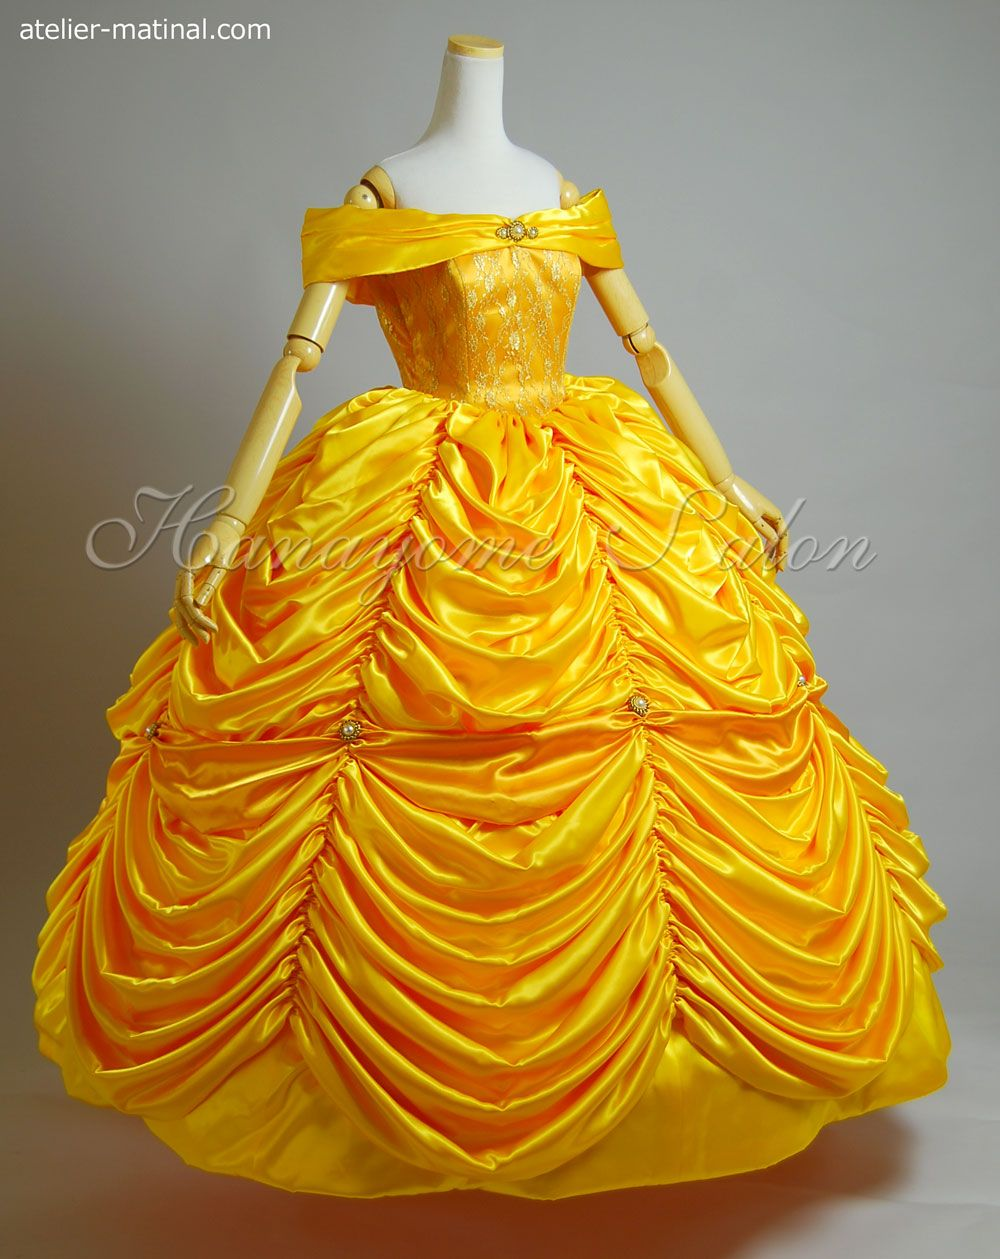 9aac62852ad5e 美女と野獣のベルのドレスのコスプレ衣装の作り方 - 自分で服を作りたい!縫い代がついた型紙(設計図)だから初心者におすすめです